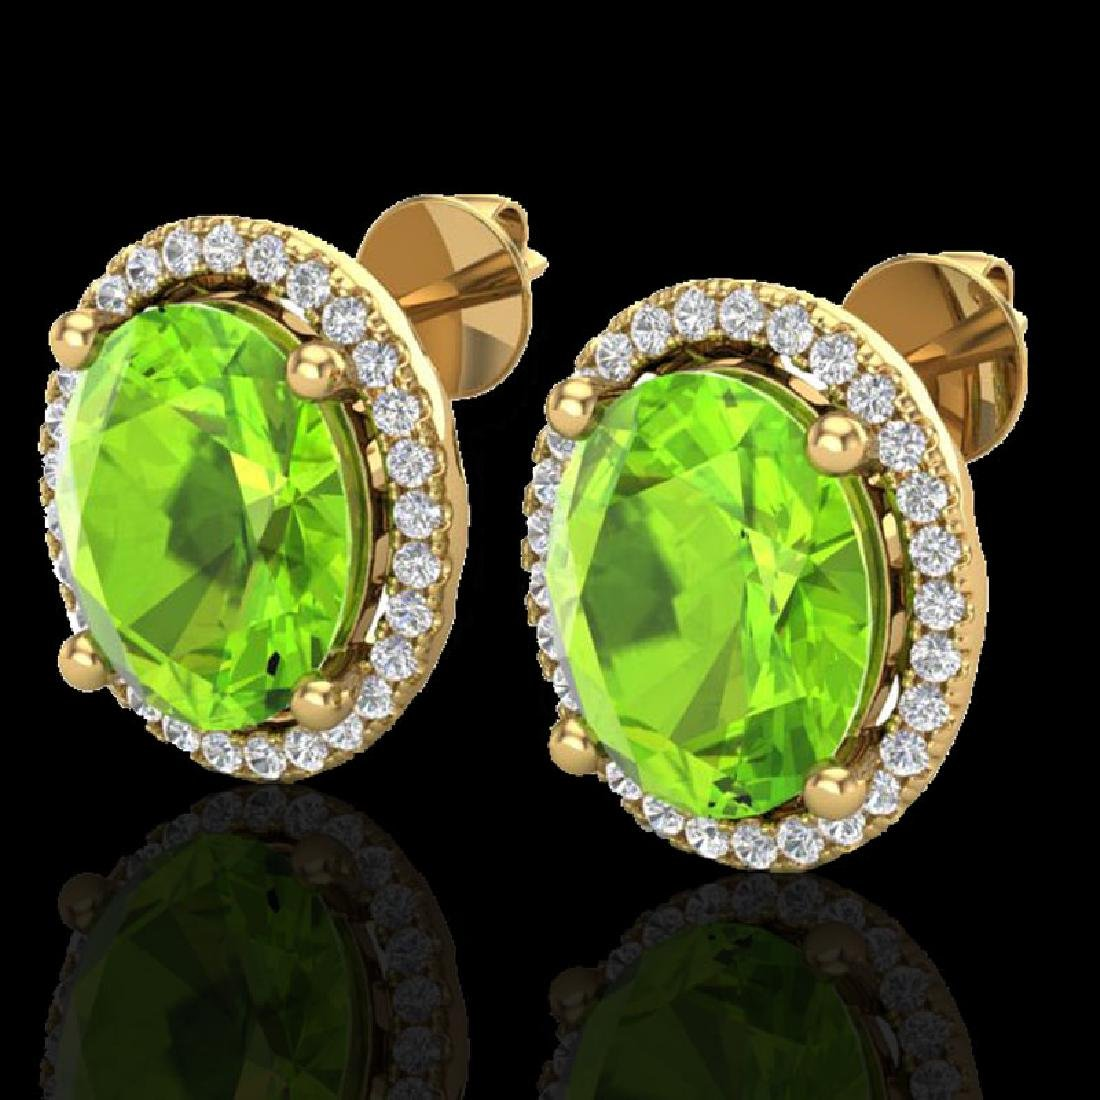 5 CTW Peridot & Micro Pave VS/SI Diamond Earrings Halo